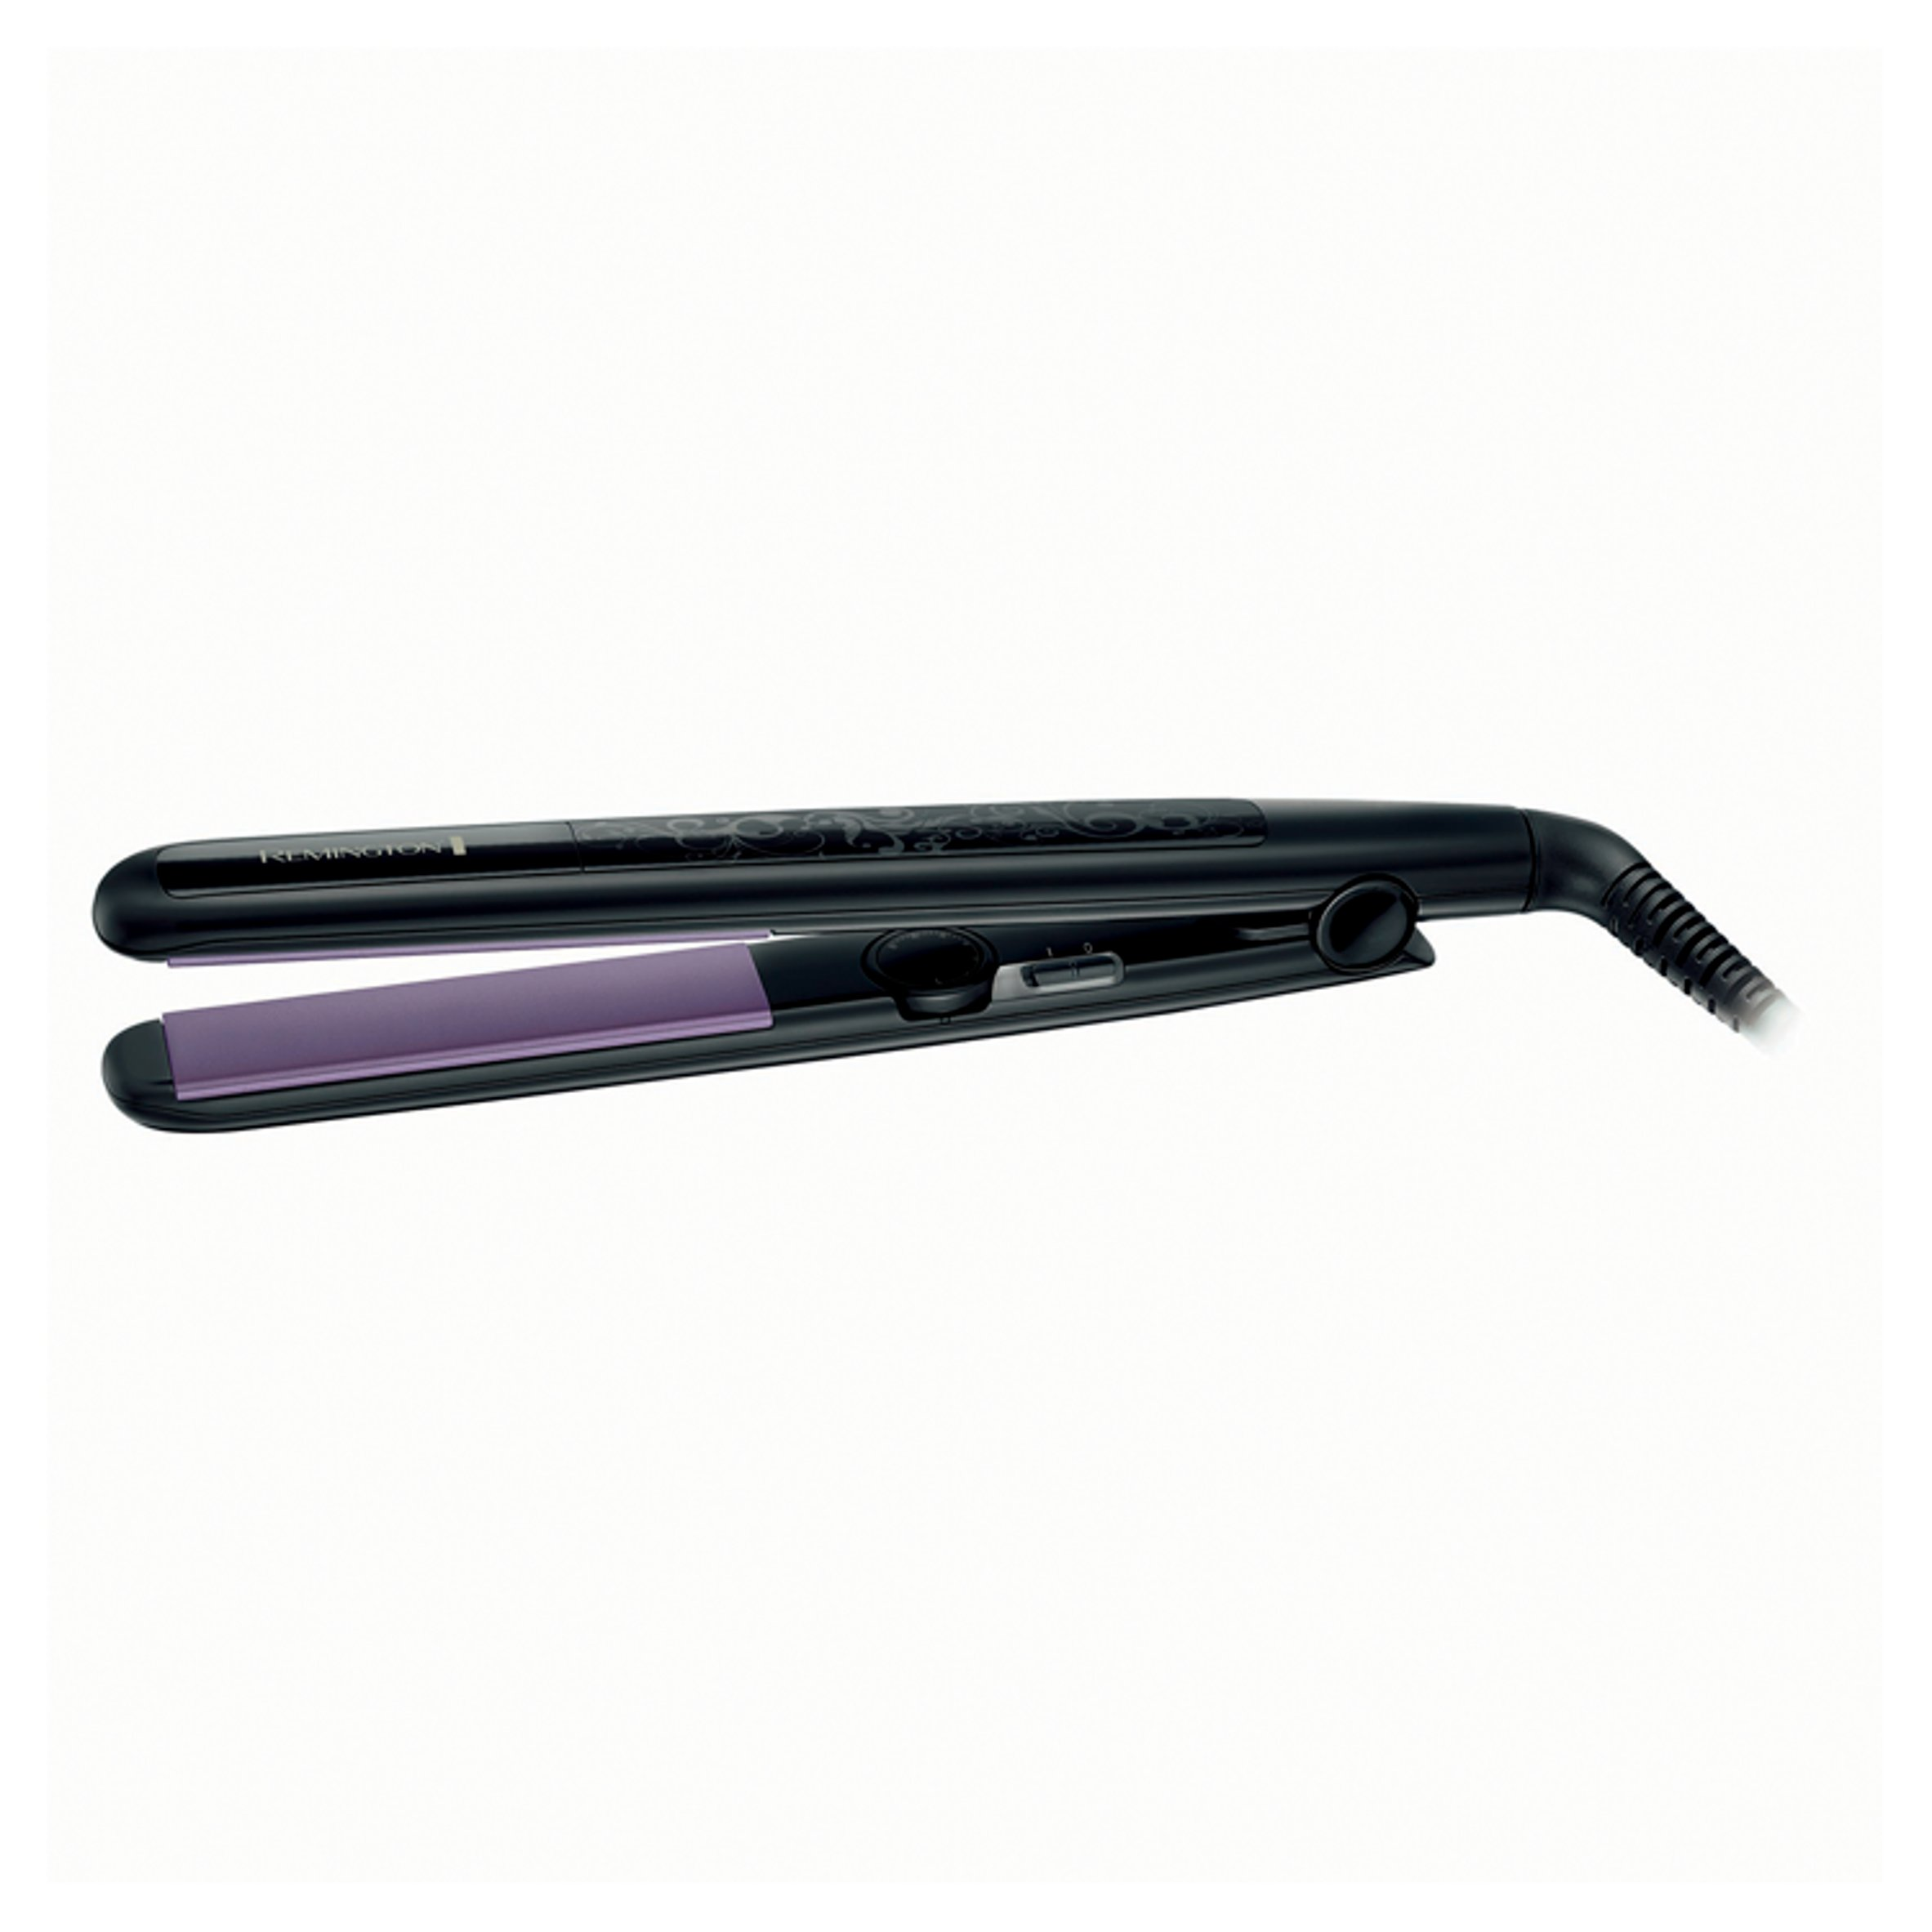 Remington S6300 Straightener